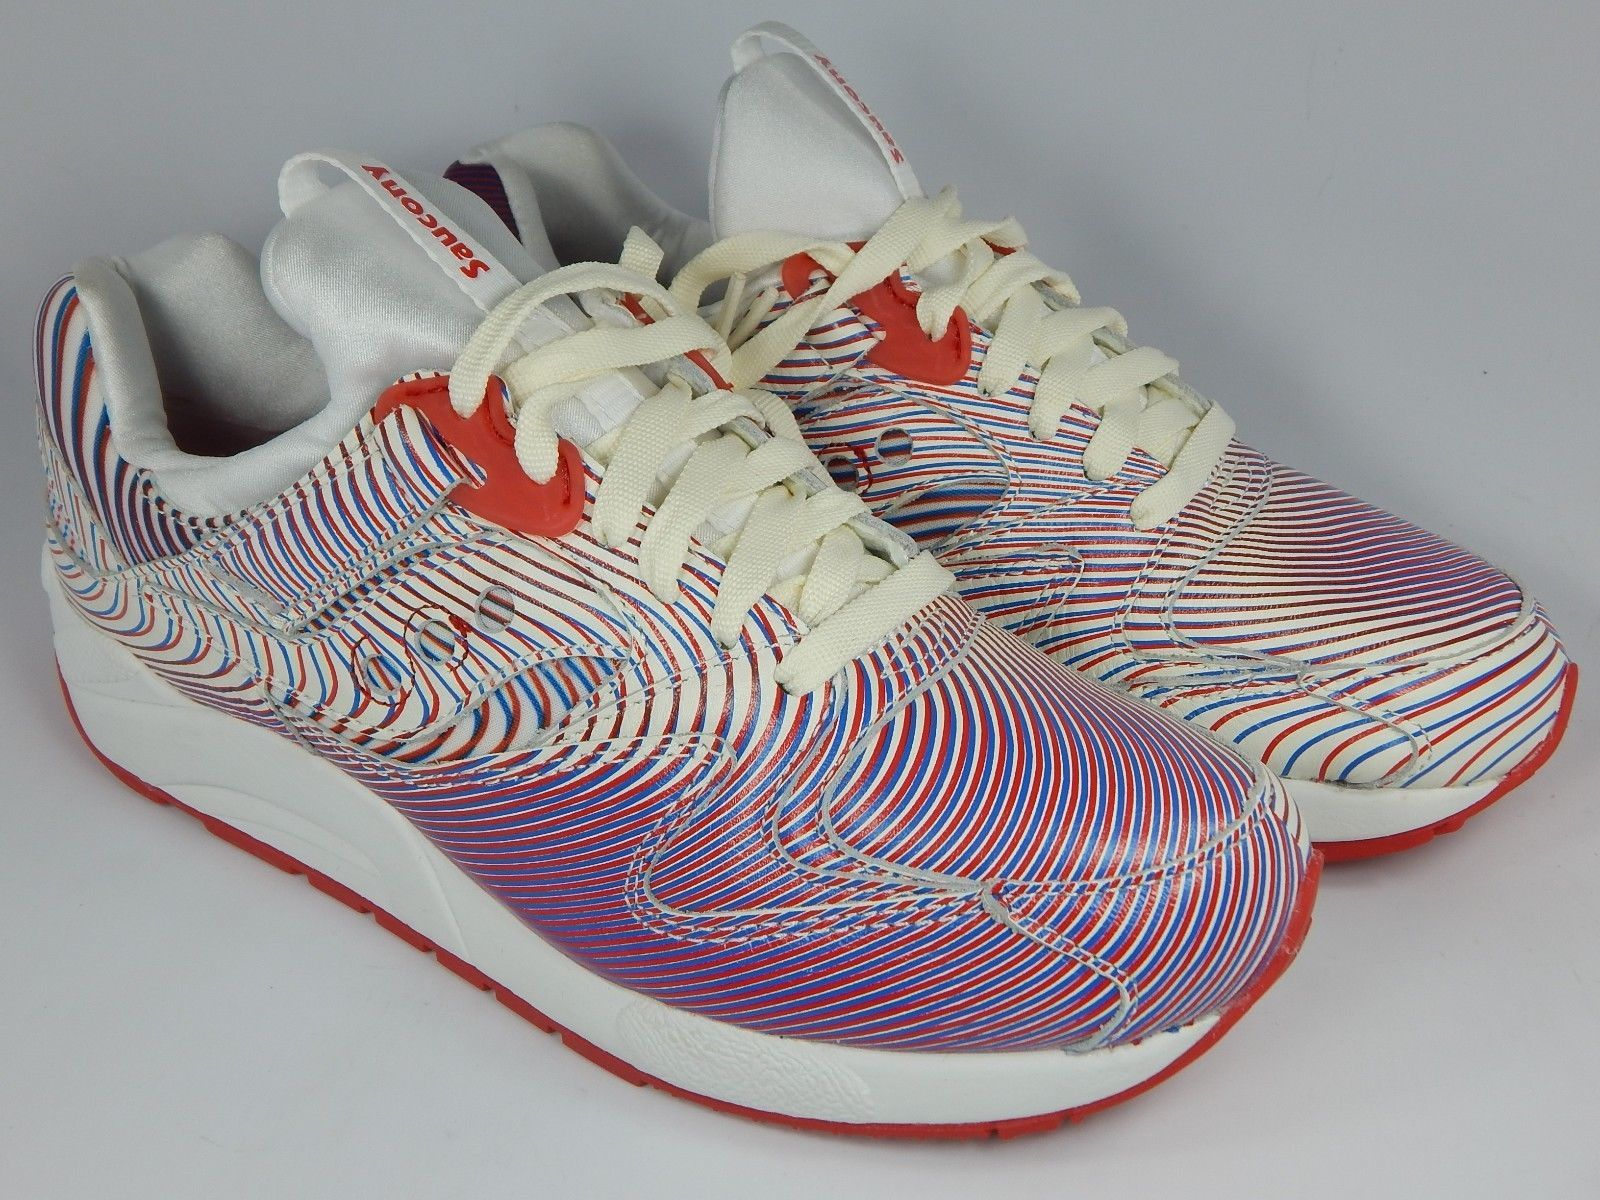 online retailer c6103 3e120 Saucony Grid 9000 HT Original Running Shoes and 50 similar items. S l1600